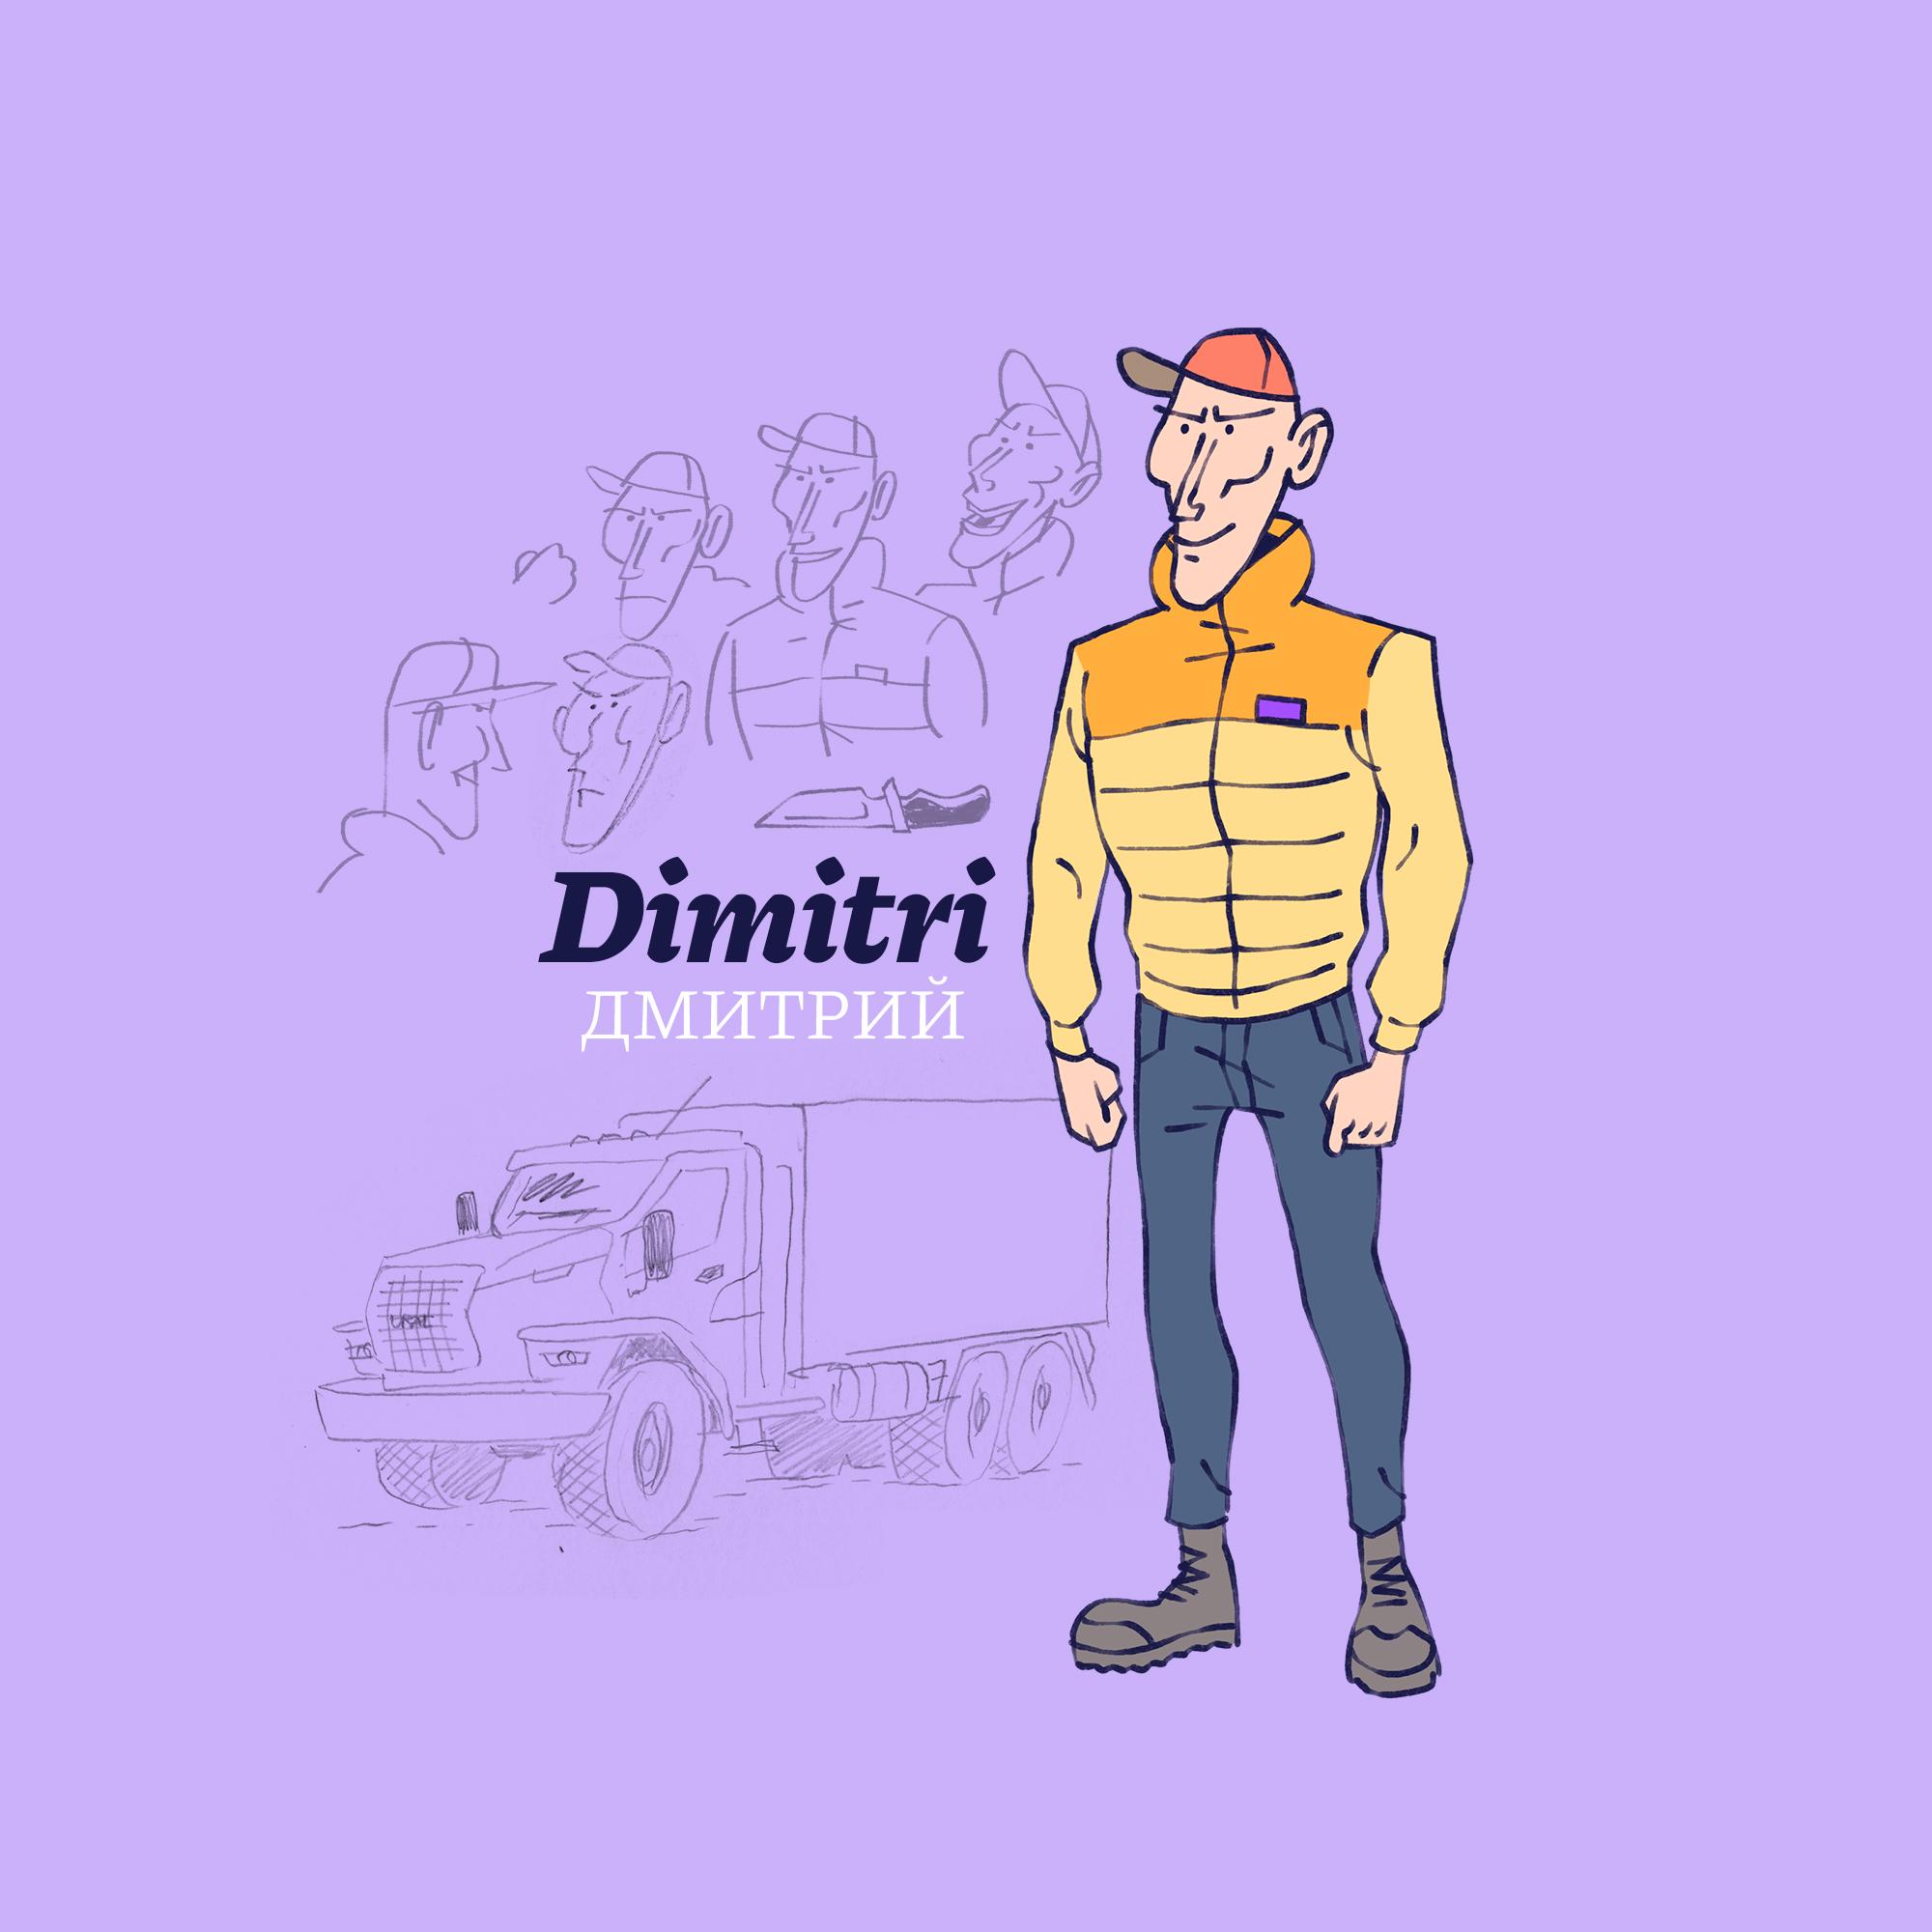 FIREBIRD-personnage-dimitri